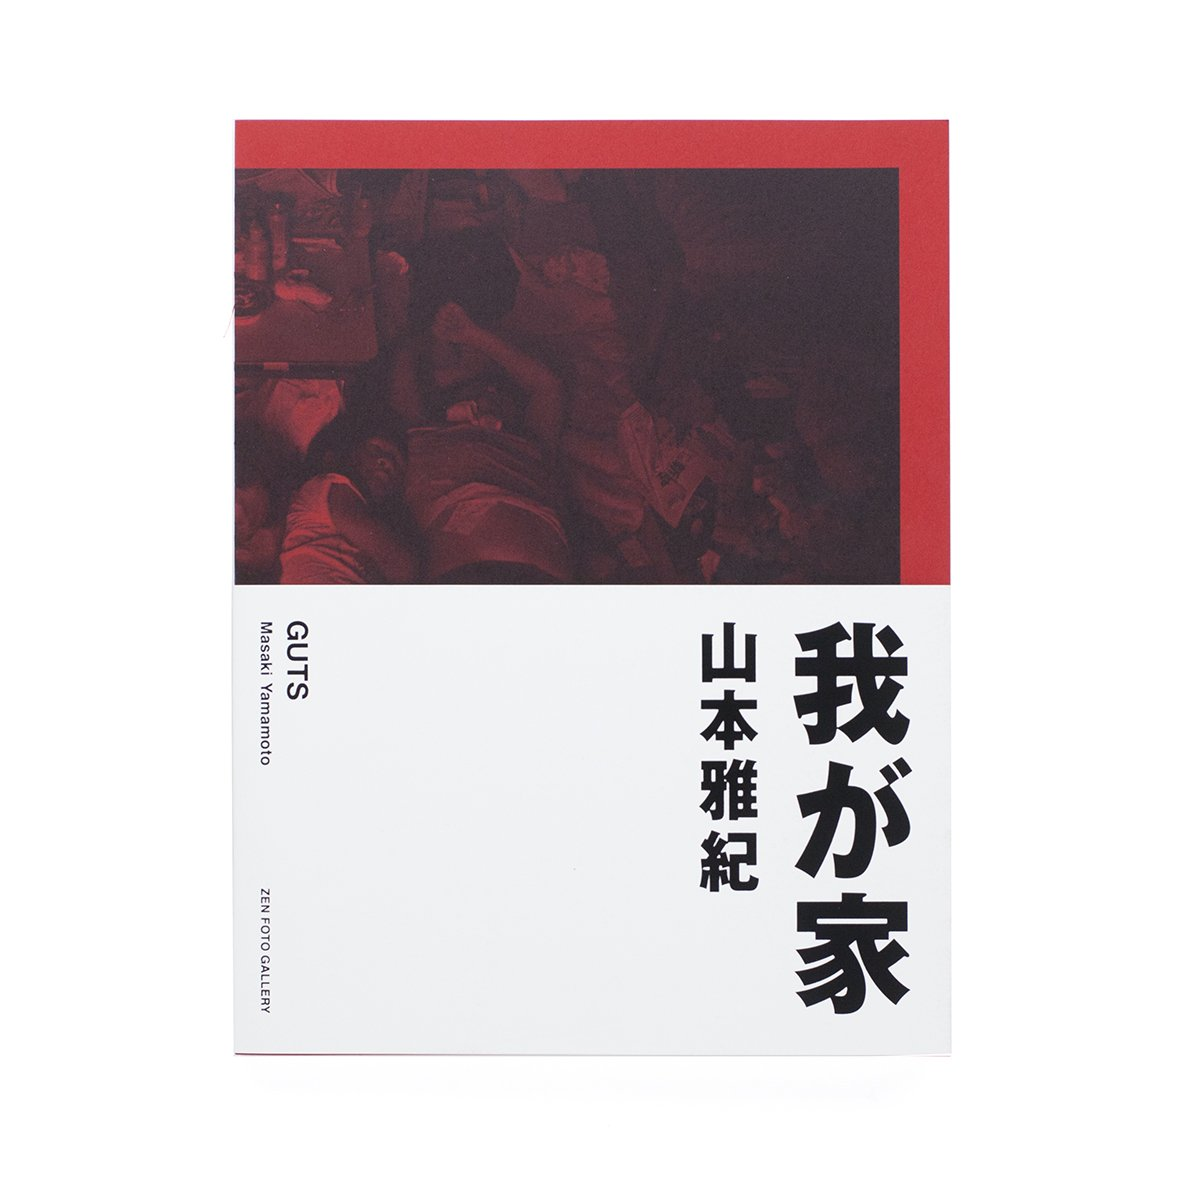 Guts pdf